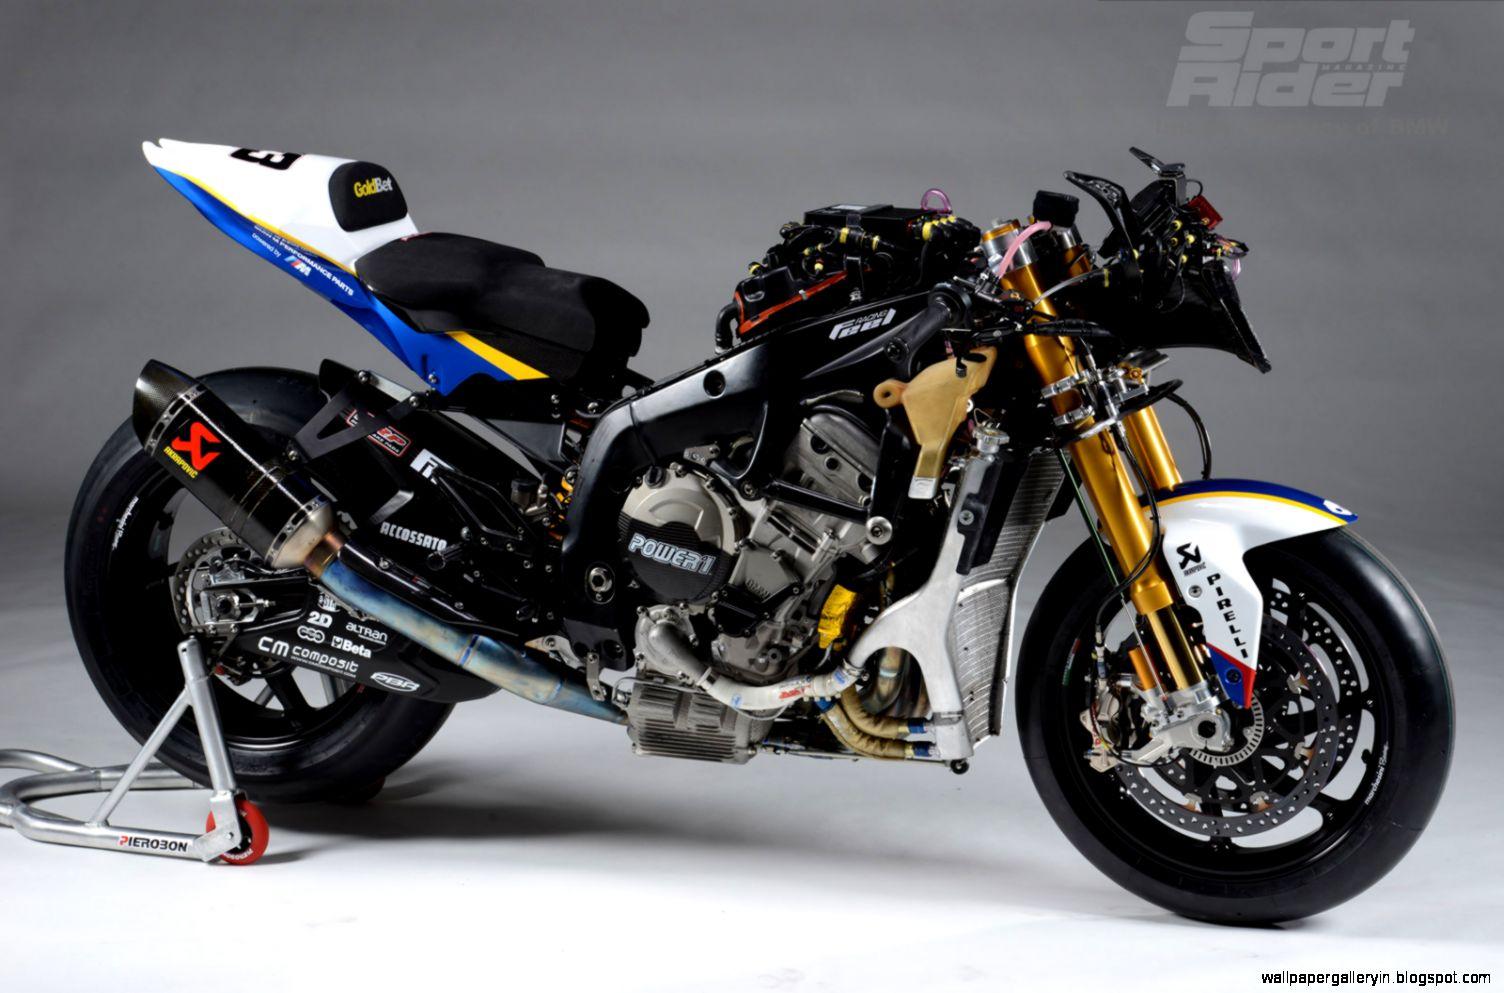 Bmw Goldbet Mechanic World Superbike Hd  Free High Definition